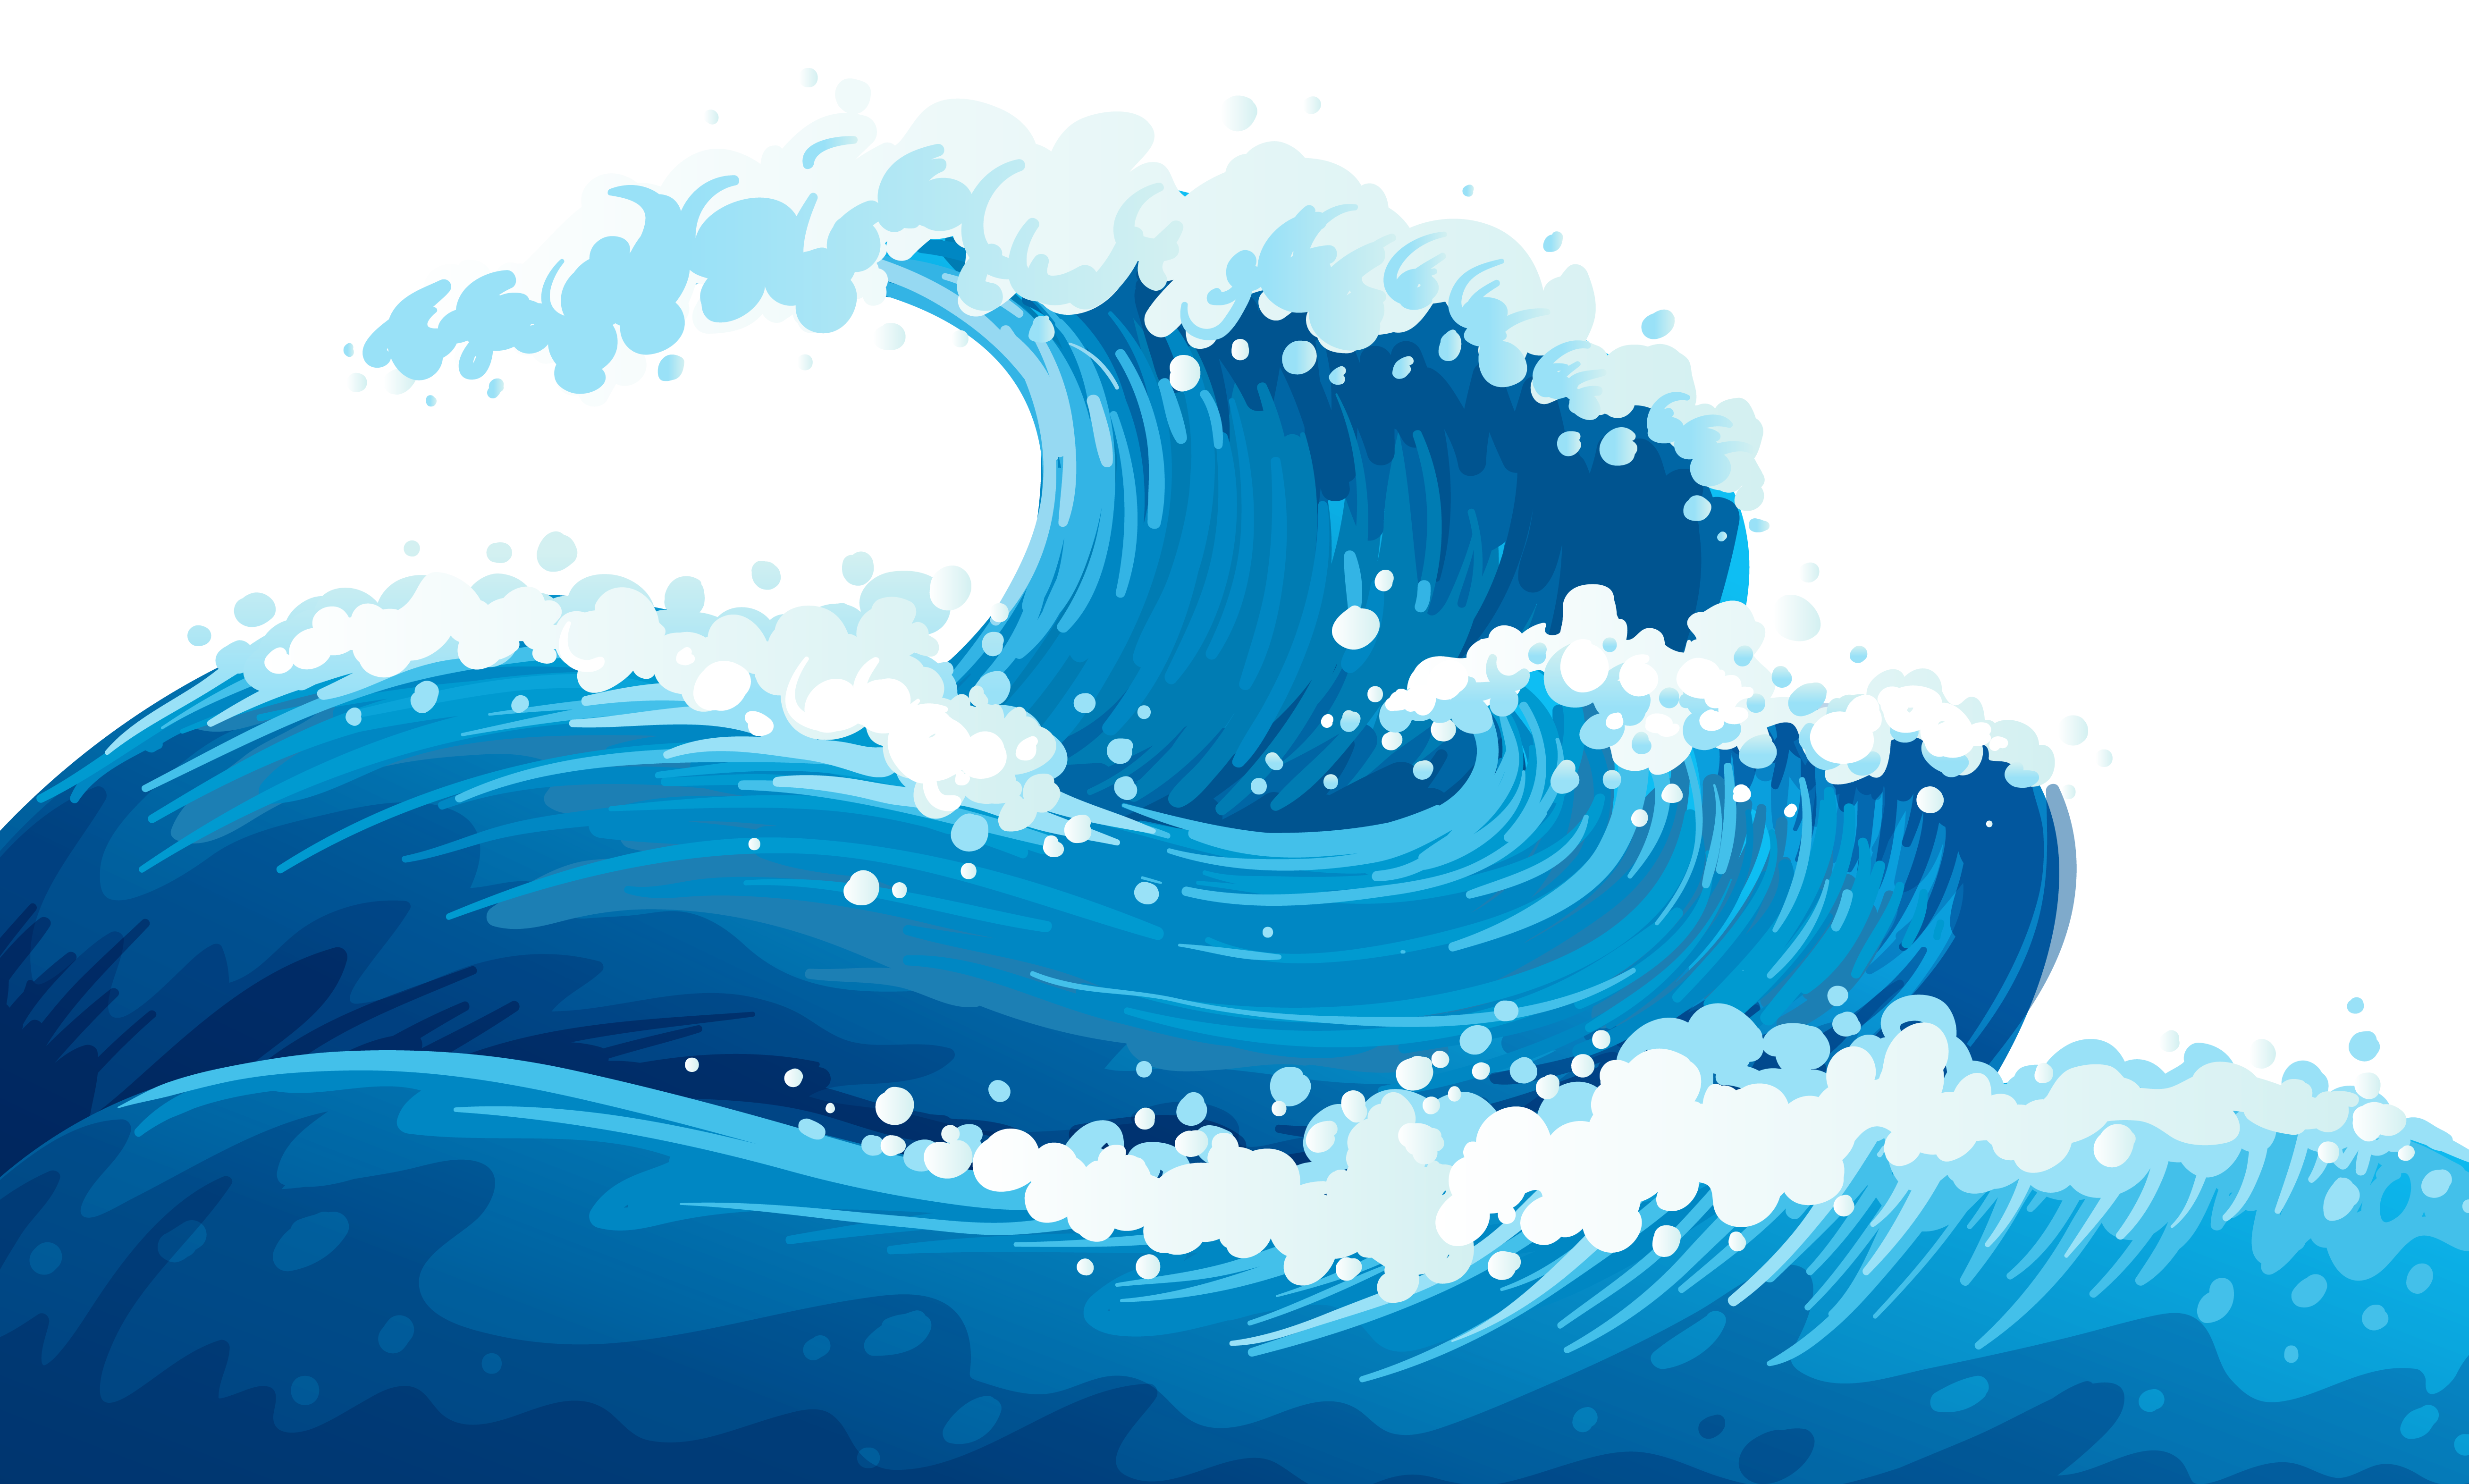 Waves Clip Art Google Search Ocean Wave Drawing Sea Illustration Sea Waves